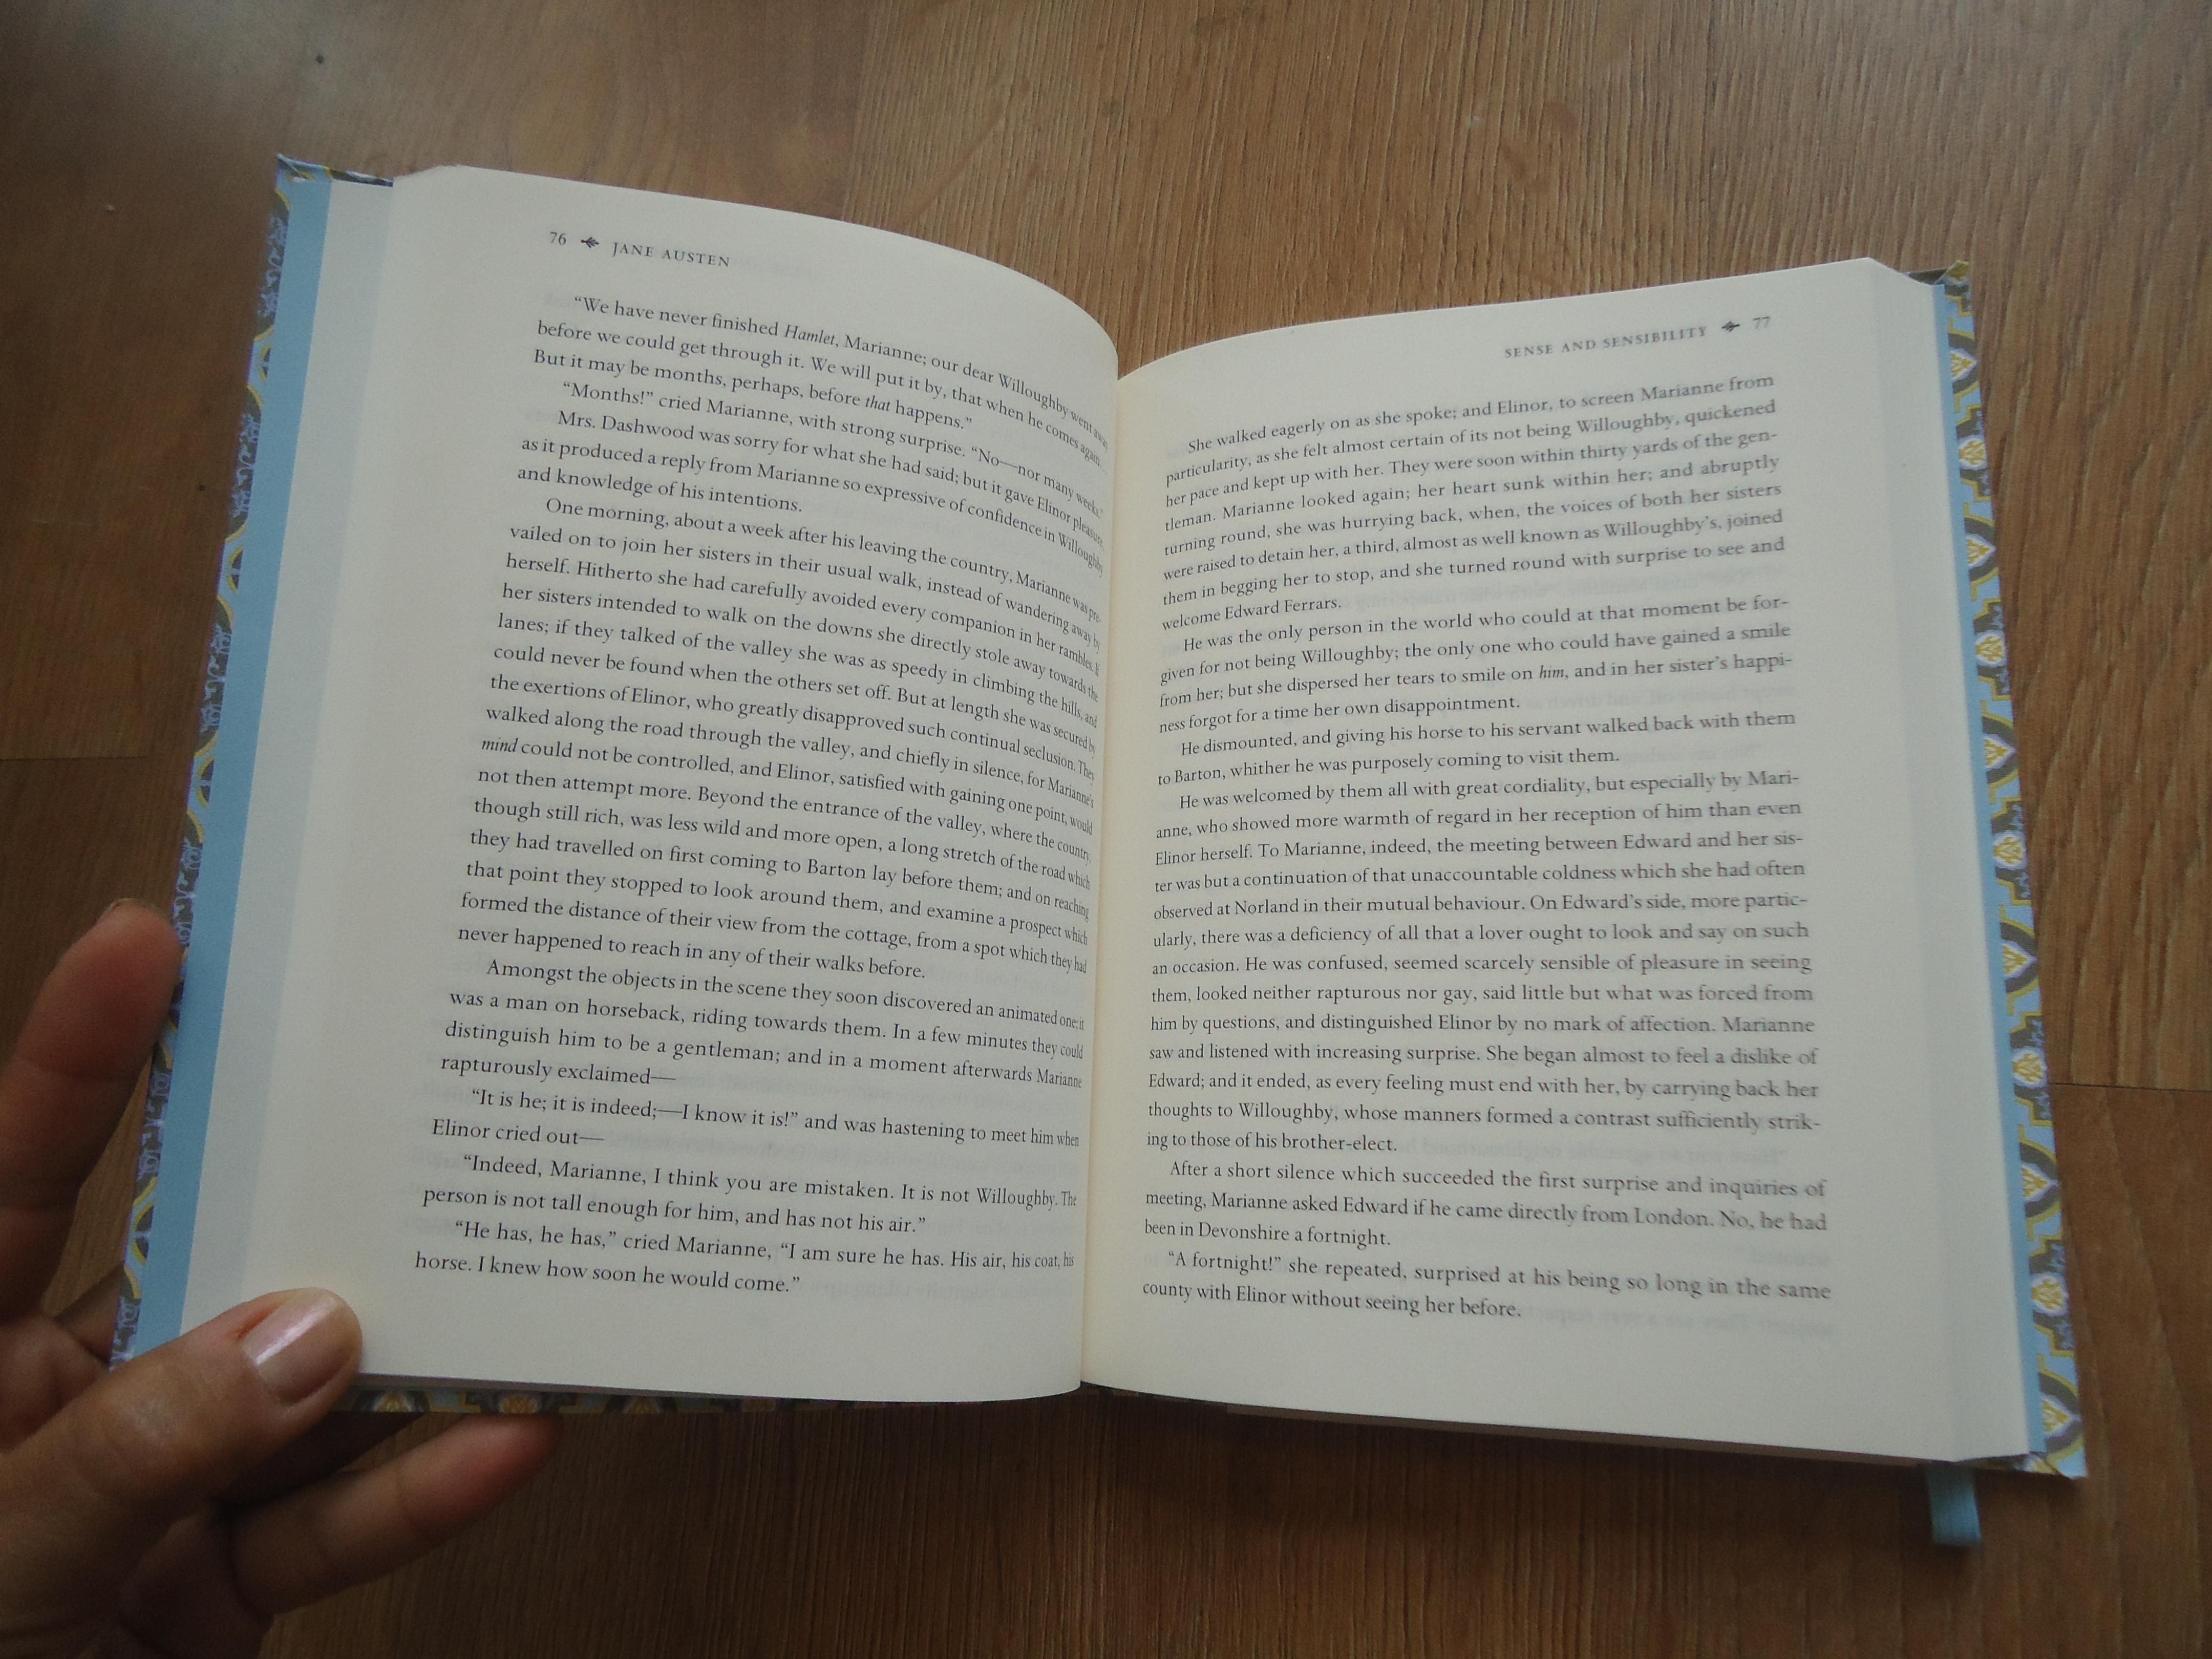 backpack, Jane Austen, Austen, classics, novel, period novel, pretty book, special edition, gifts